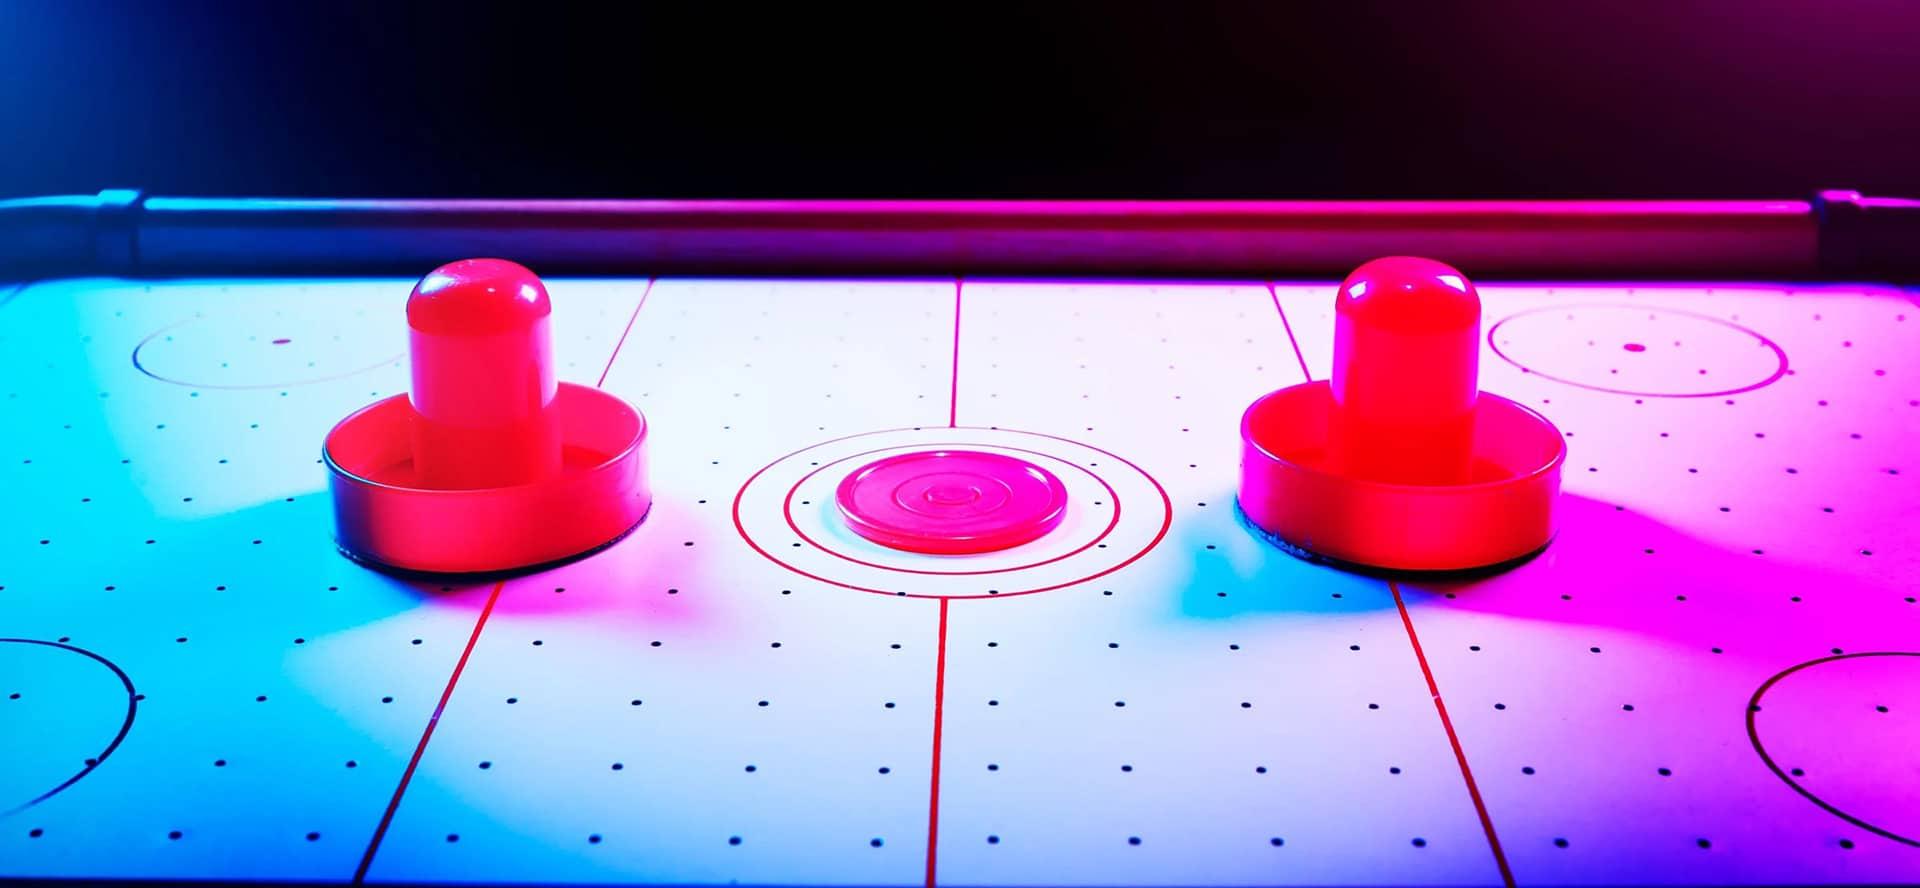 Air Hockey Wooden Mini Table Top Game Set Kids Desktop Arcade Play Toy Family Fun Xmas Gift Hatha